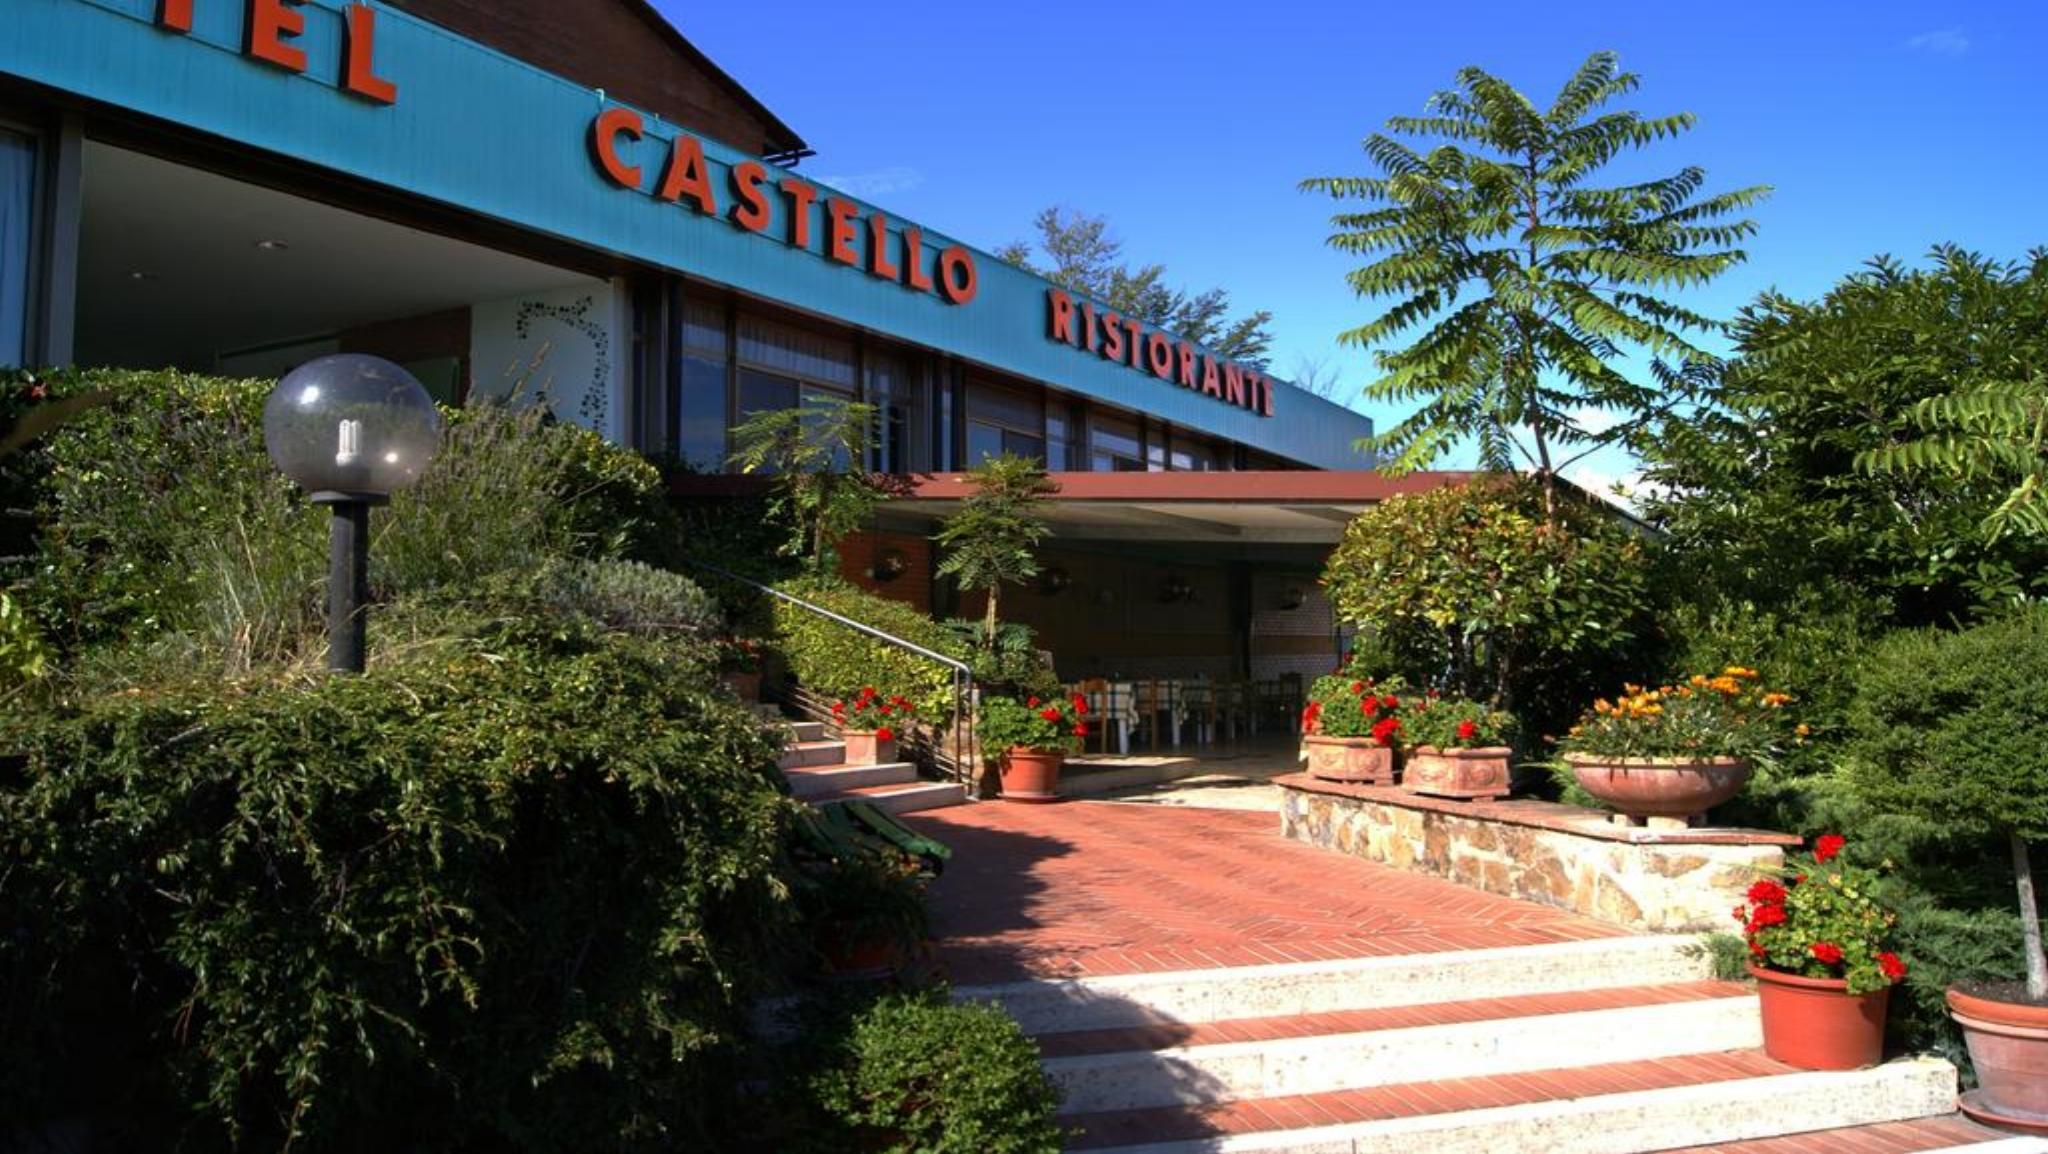 L'ingresso de Hotel Castello